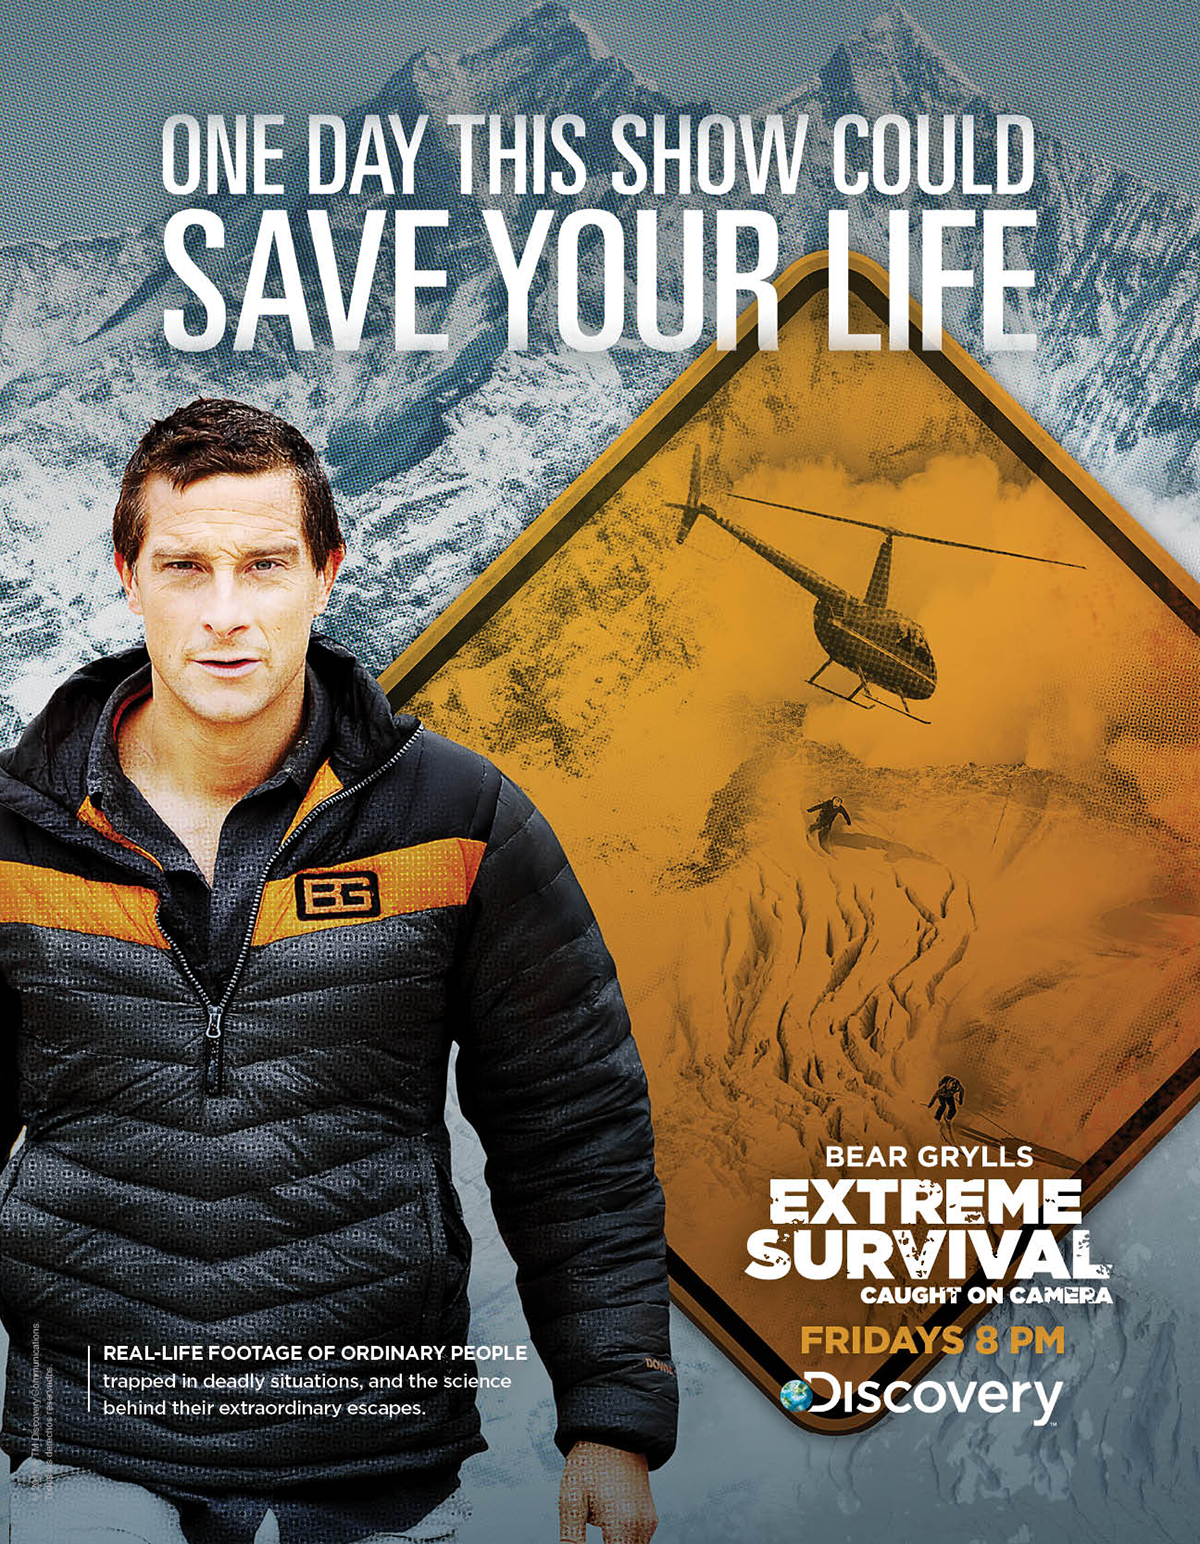 Bear Grylls Extreme Survival Caught on Camera